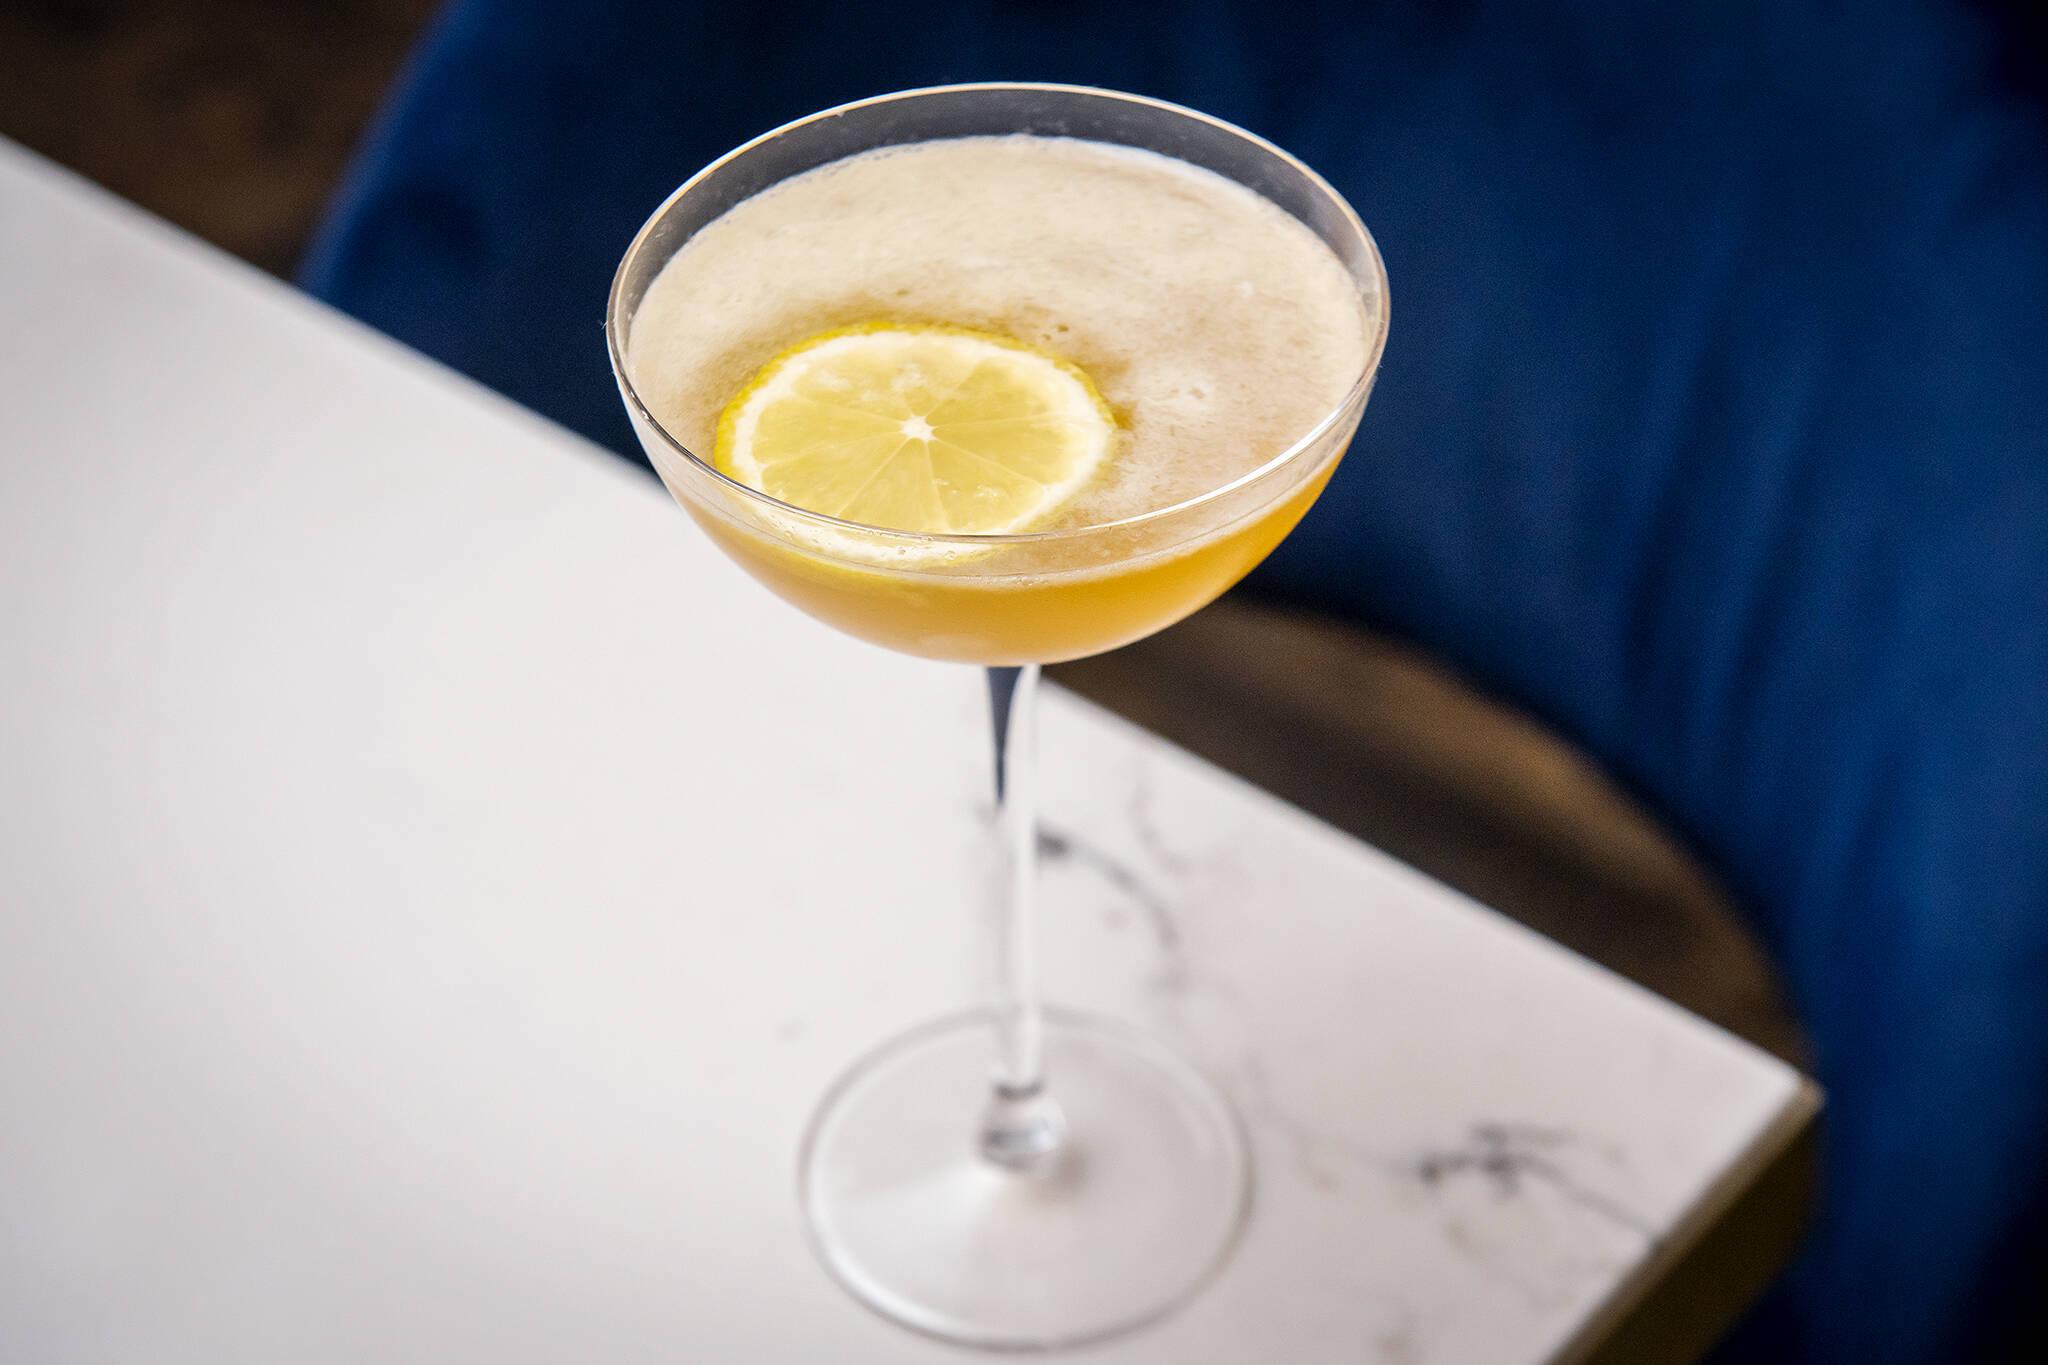 whisky cocktails toronto